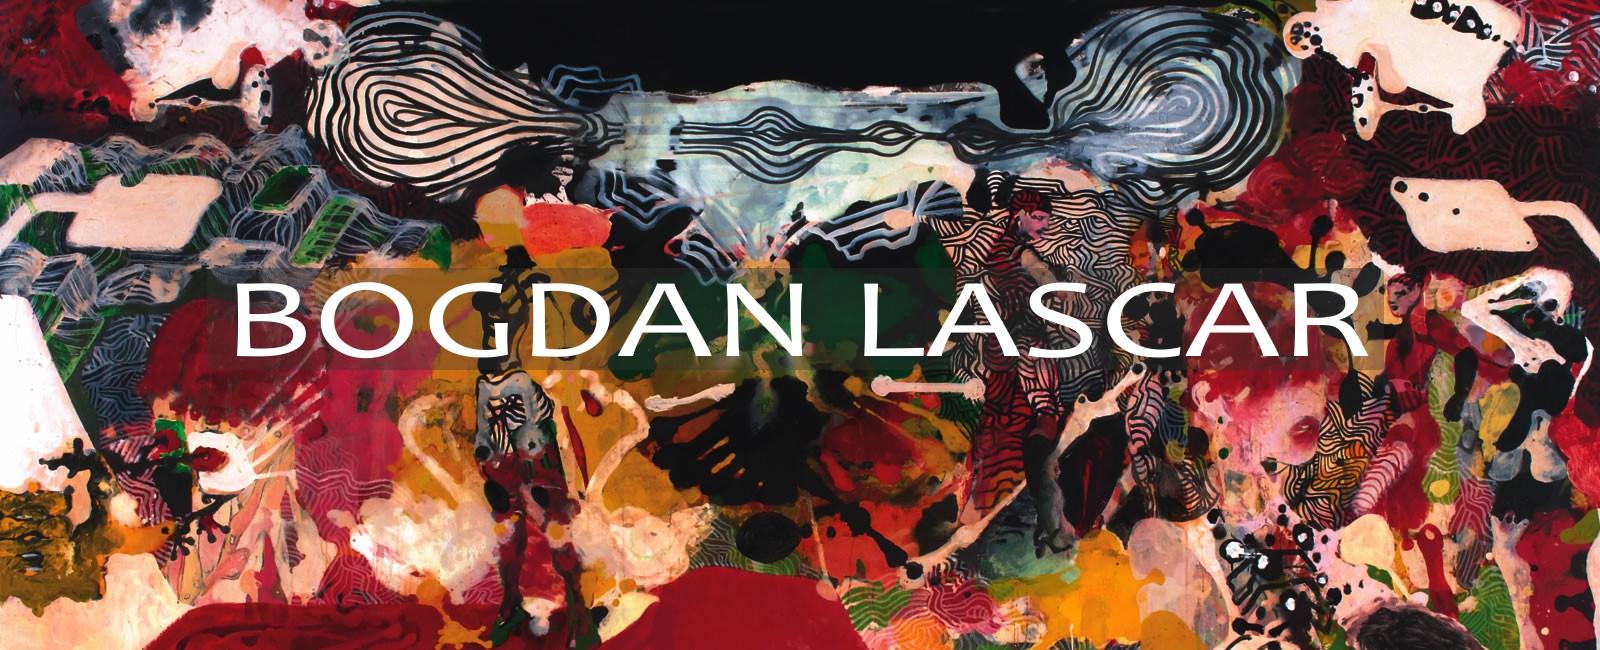 Bogdan Lascar